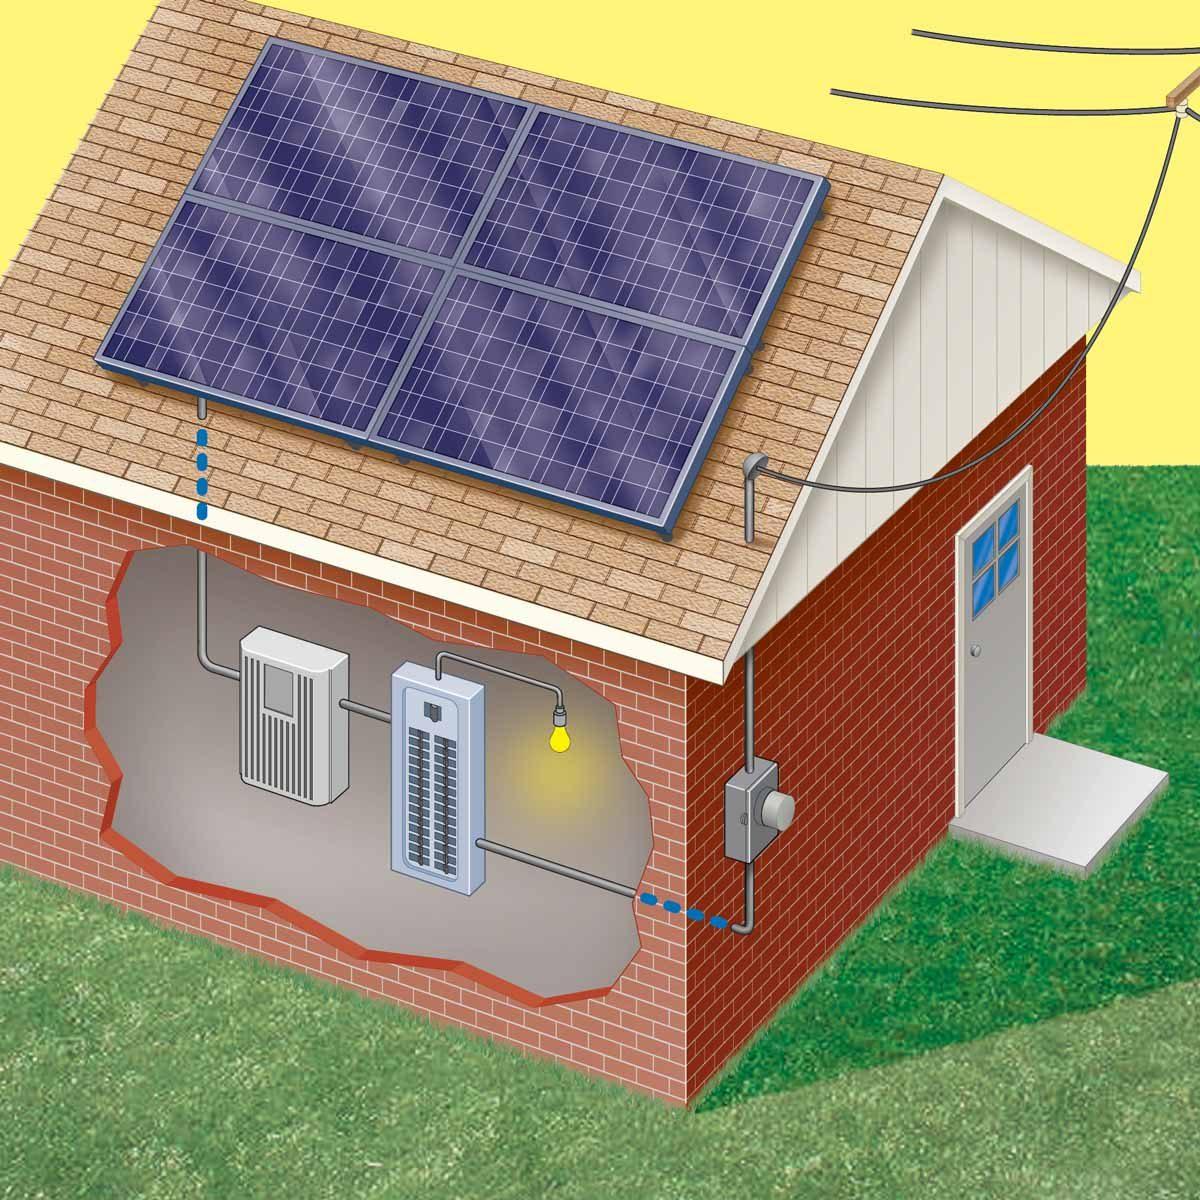 grid-tied system solar panels